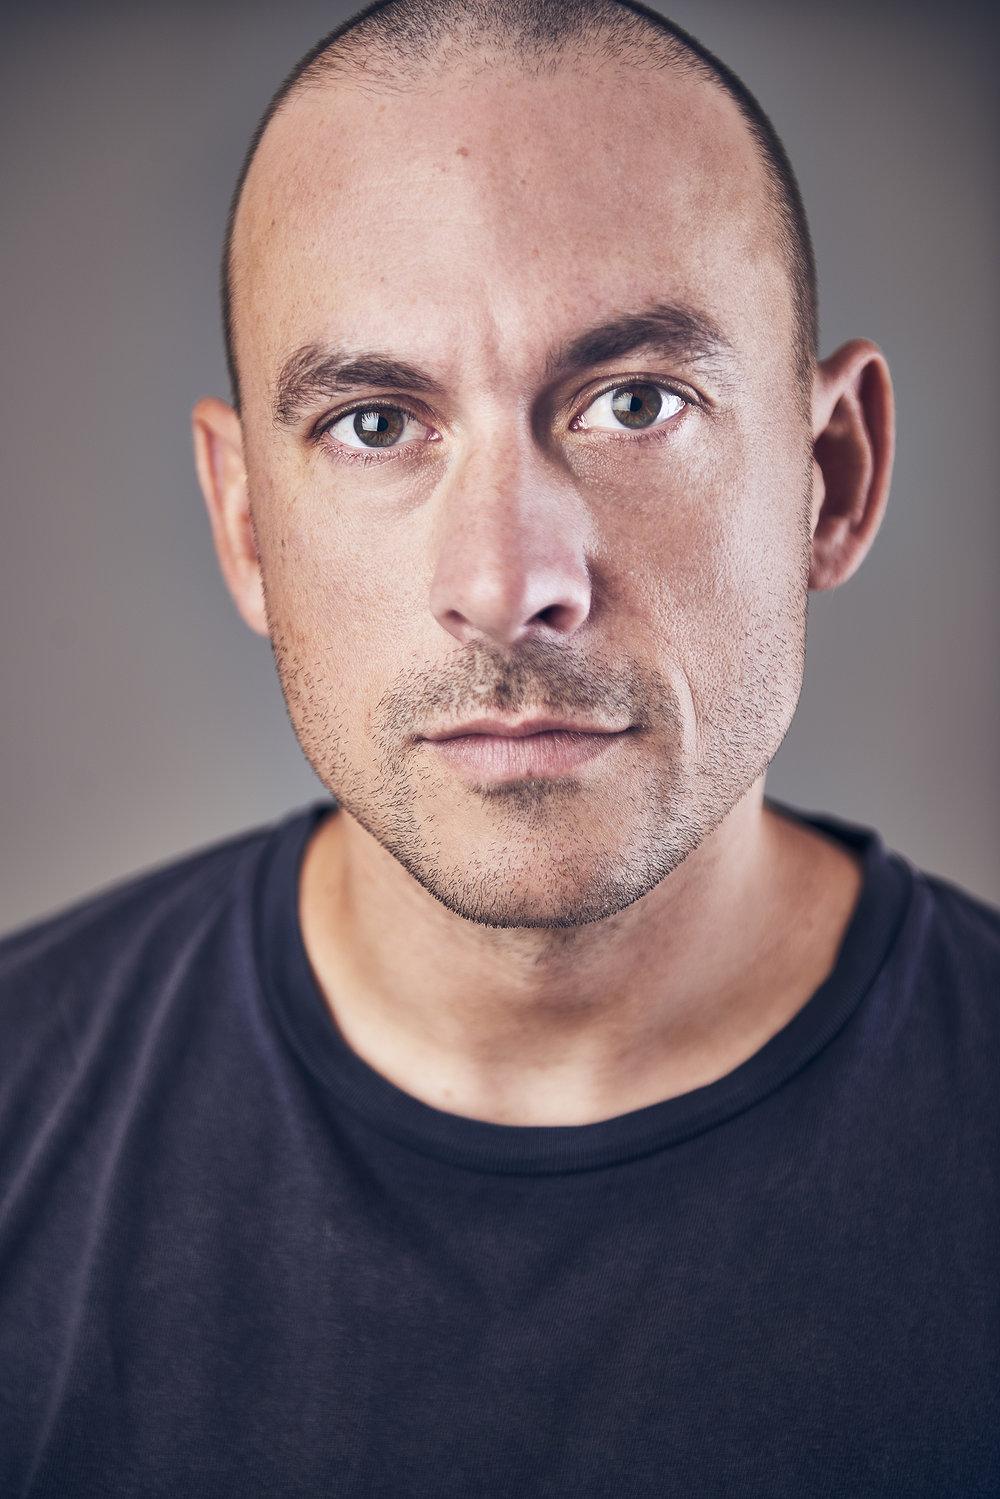 Josh John Photographer : Headshot